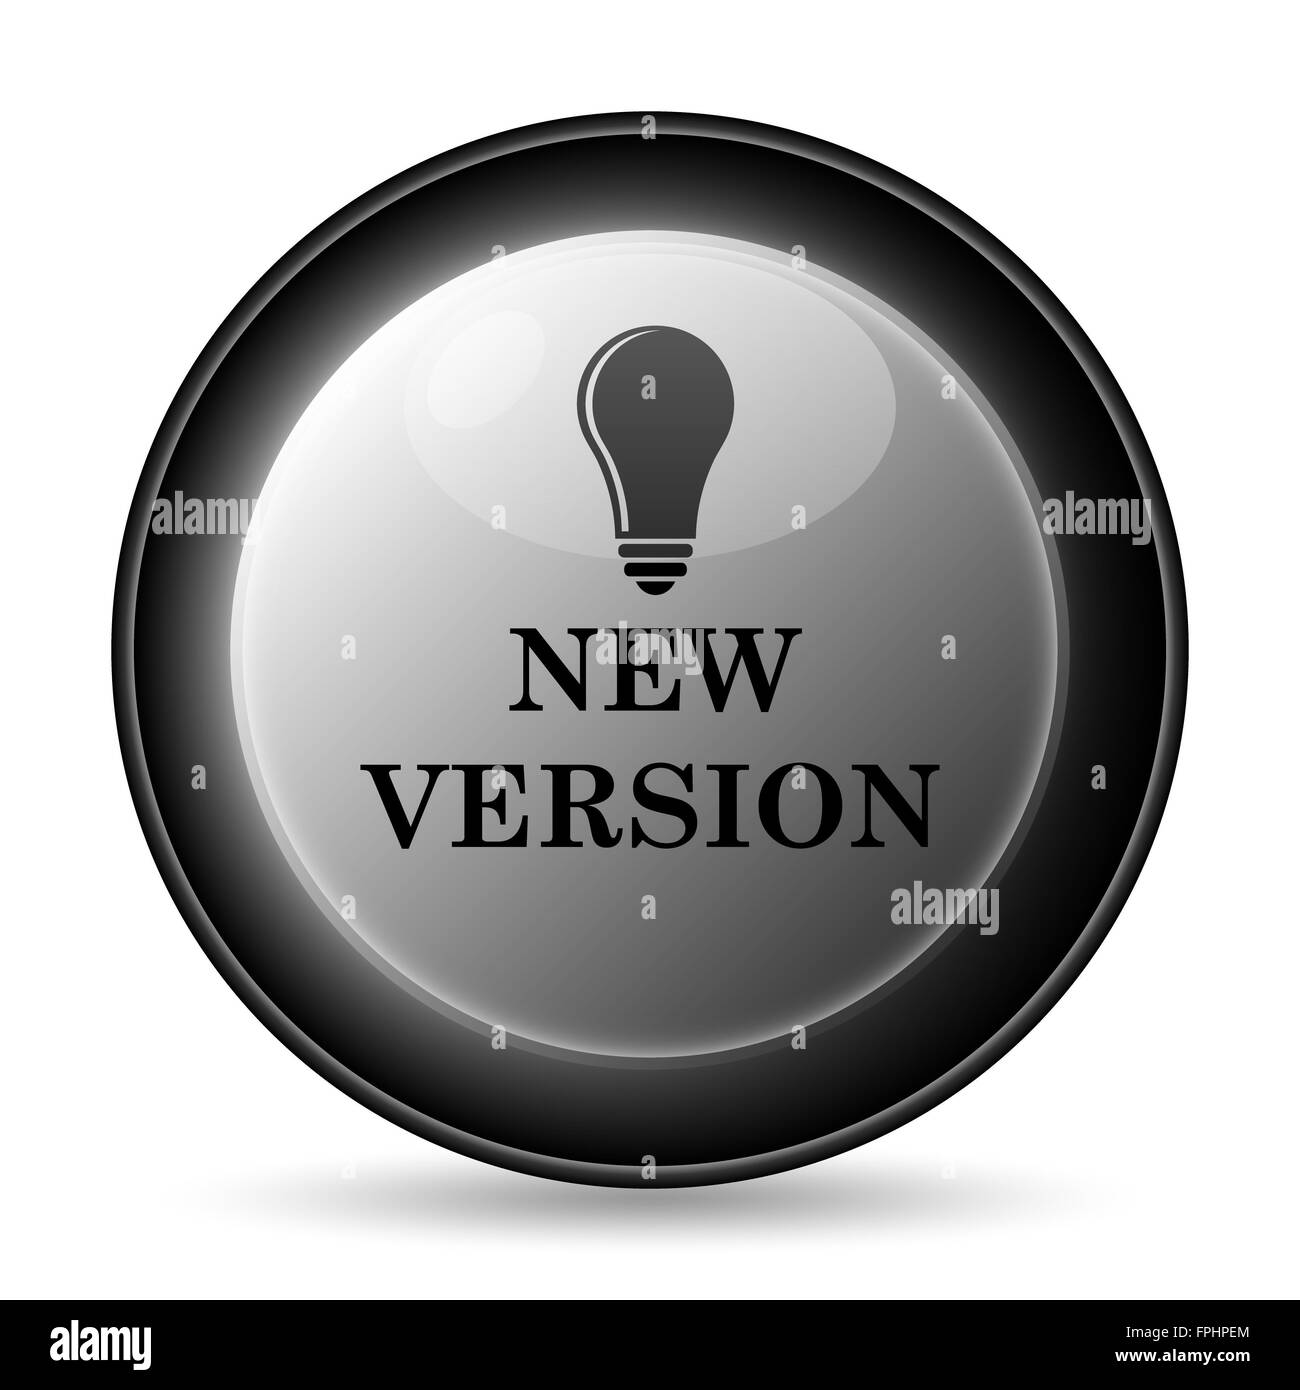 New version icon. Internet button on white background. - Stock Image